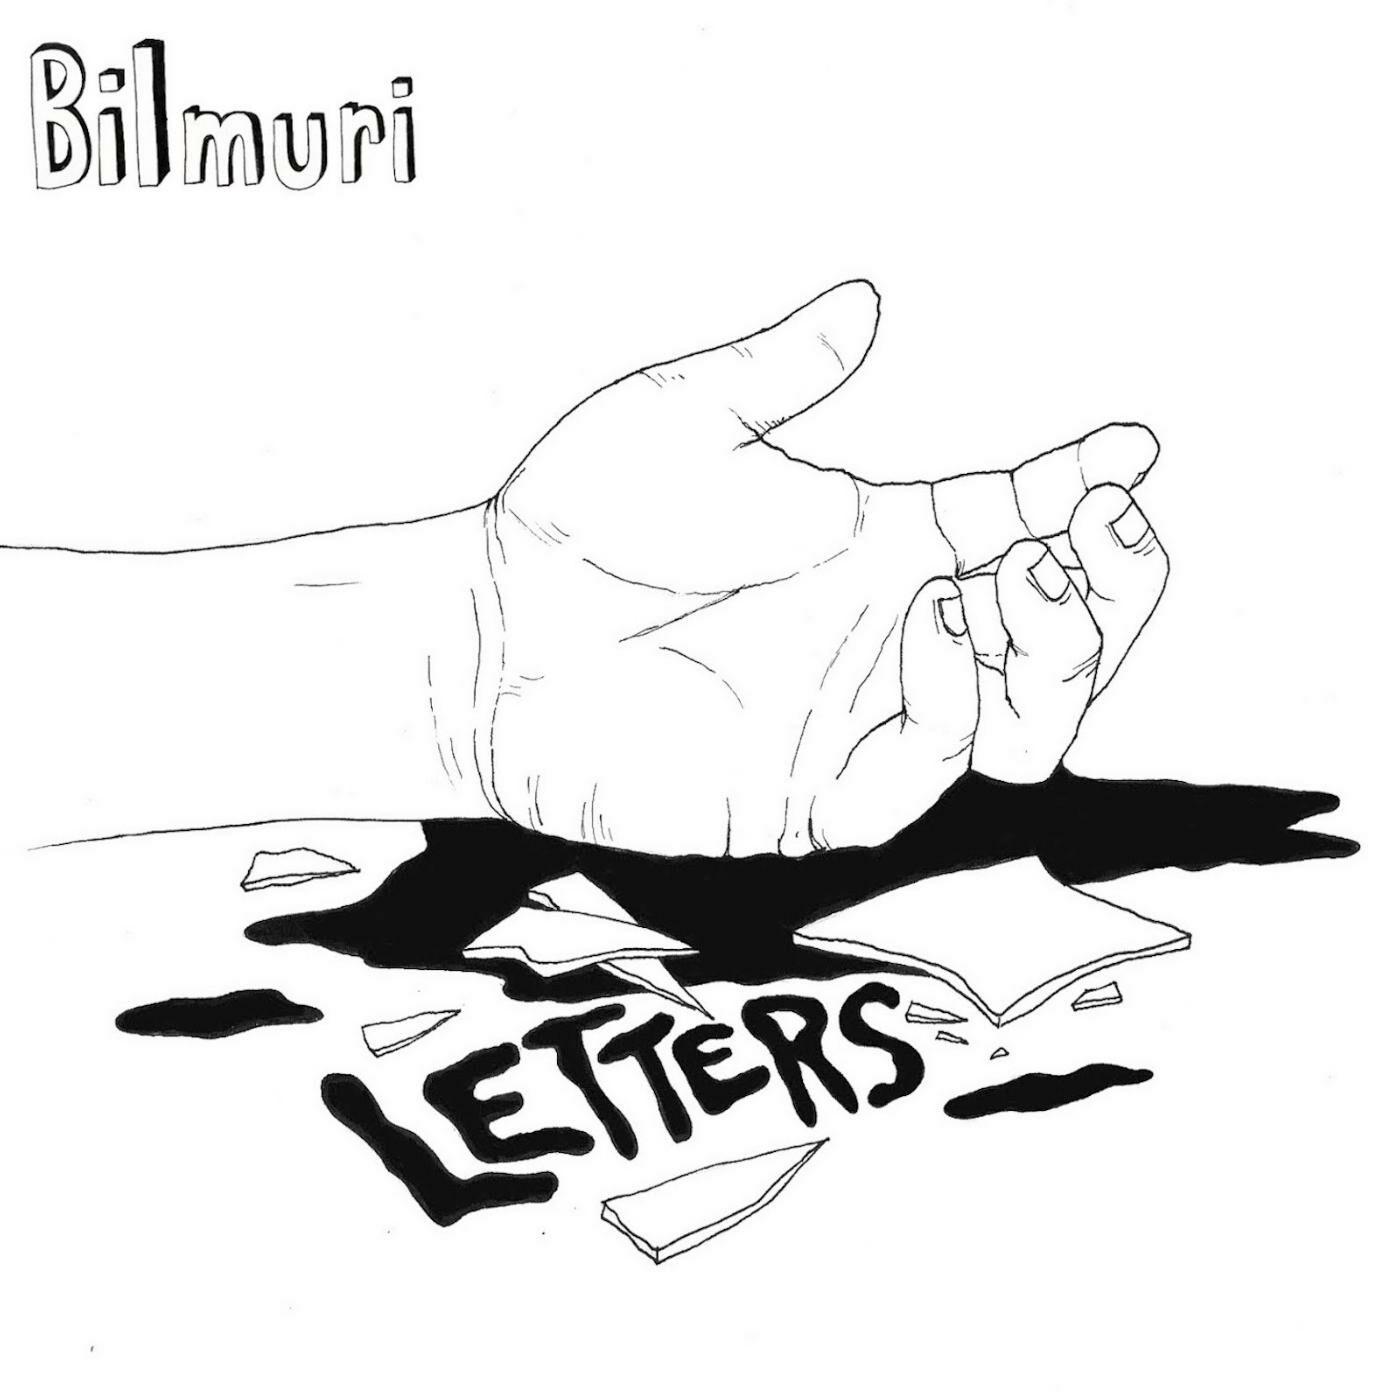 Bilmuri - Letters (2016)